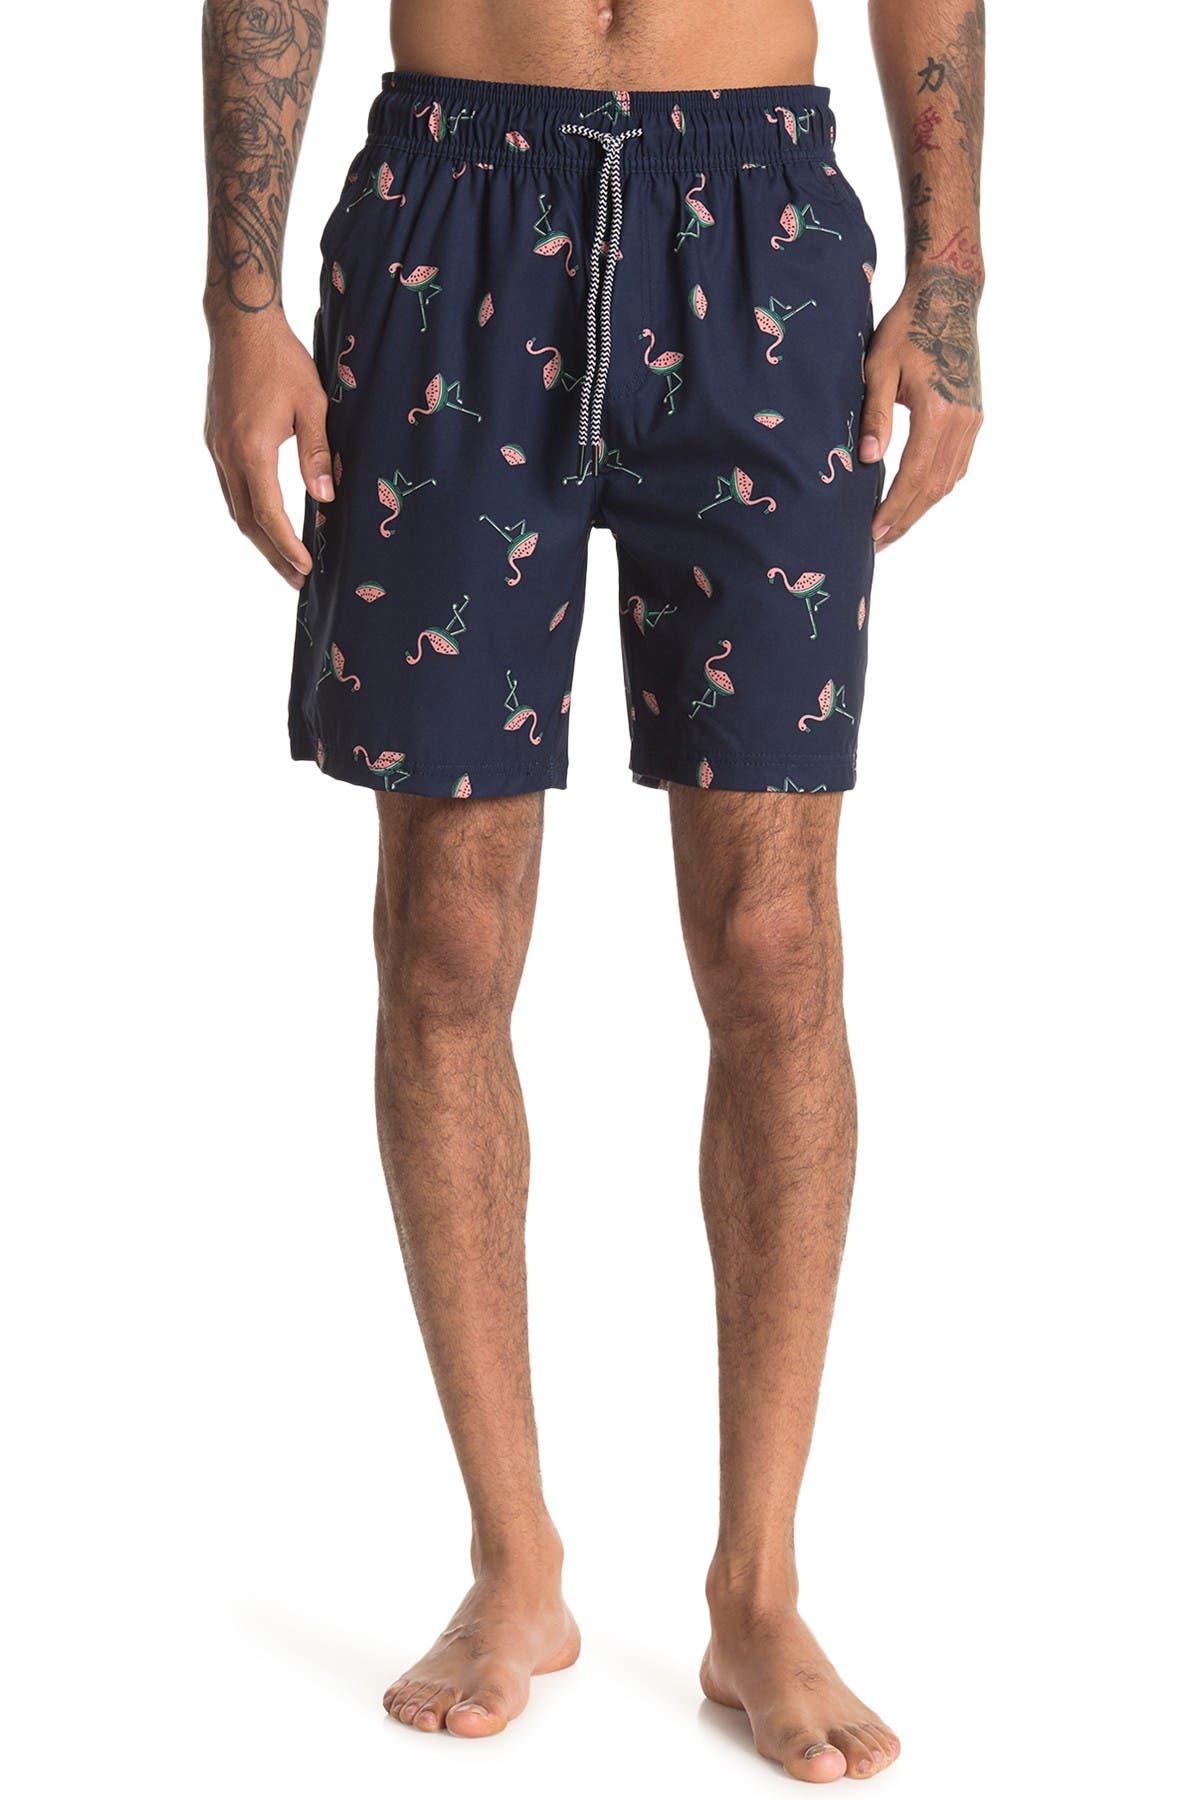 Image of Sovereign Code Dune Patterned Swim Shorts